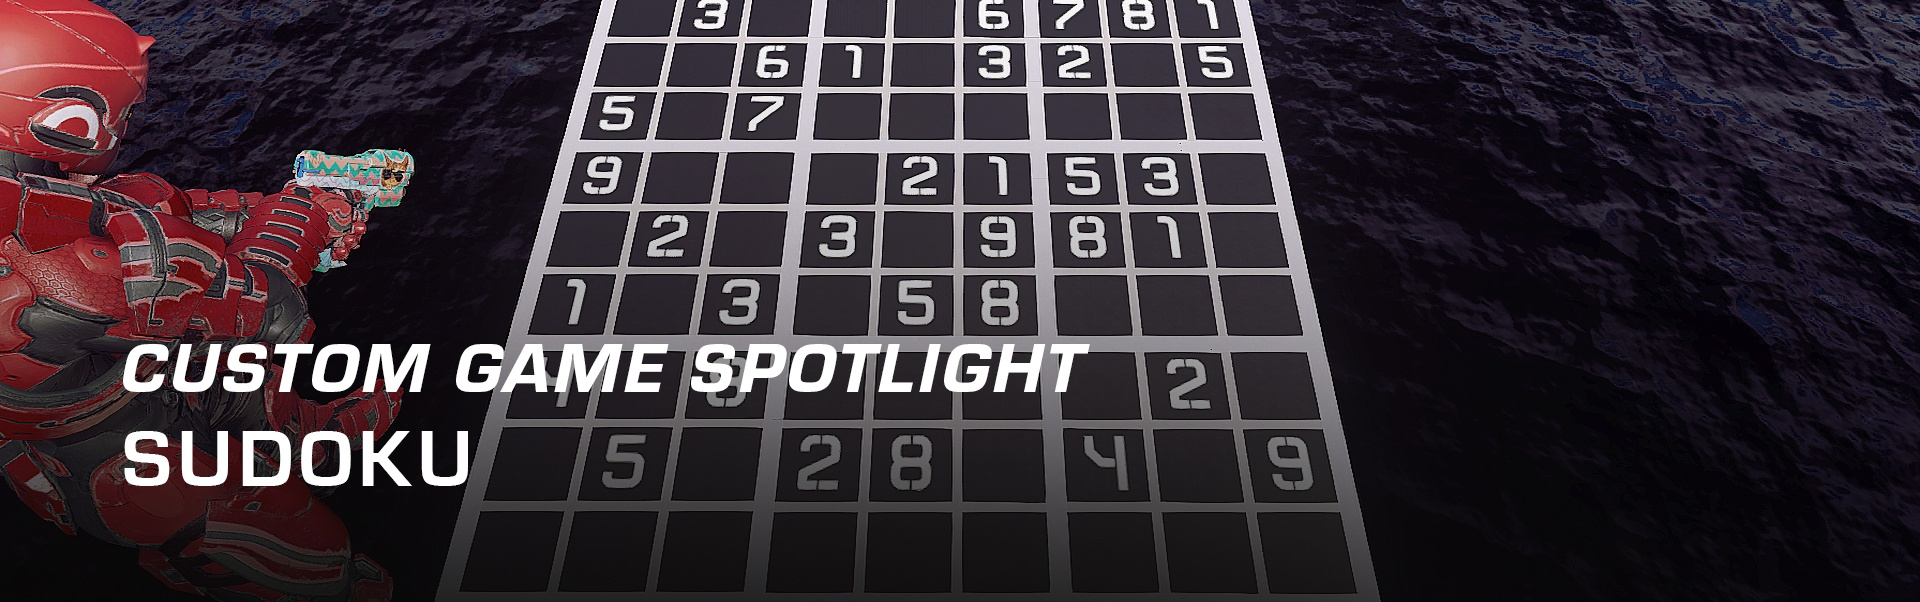 custom_game_spotlight_-_SUDOKU.jpg